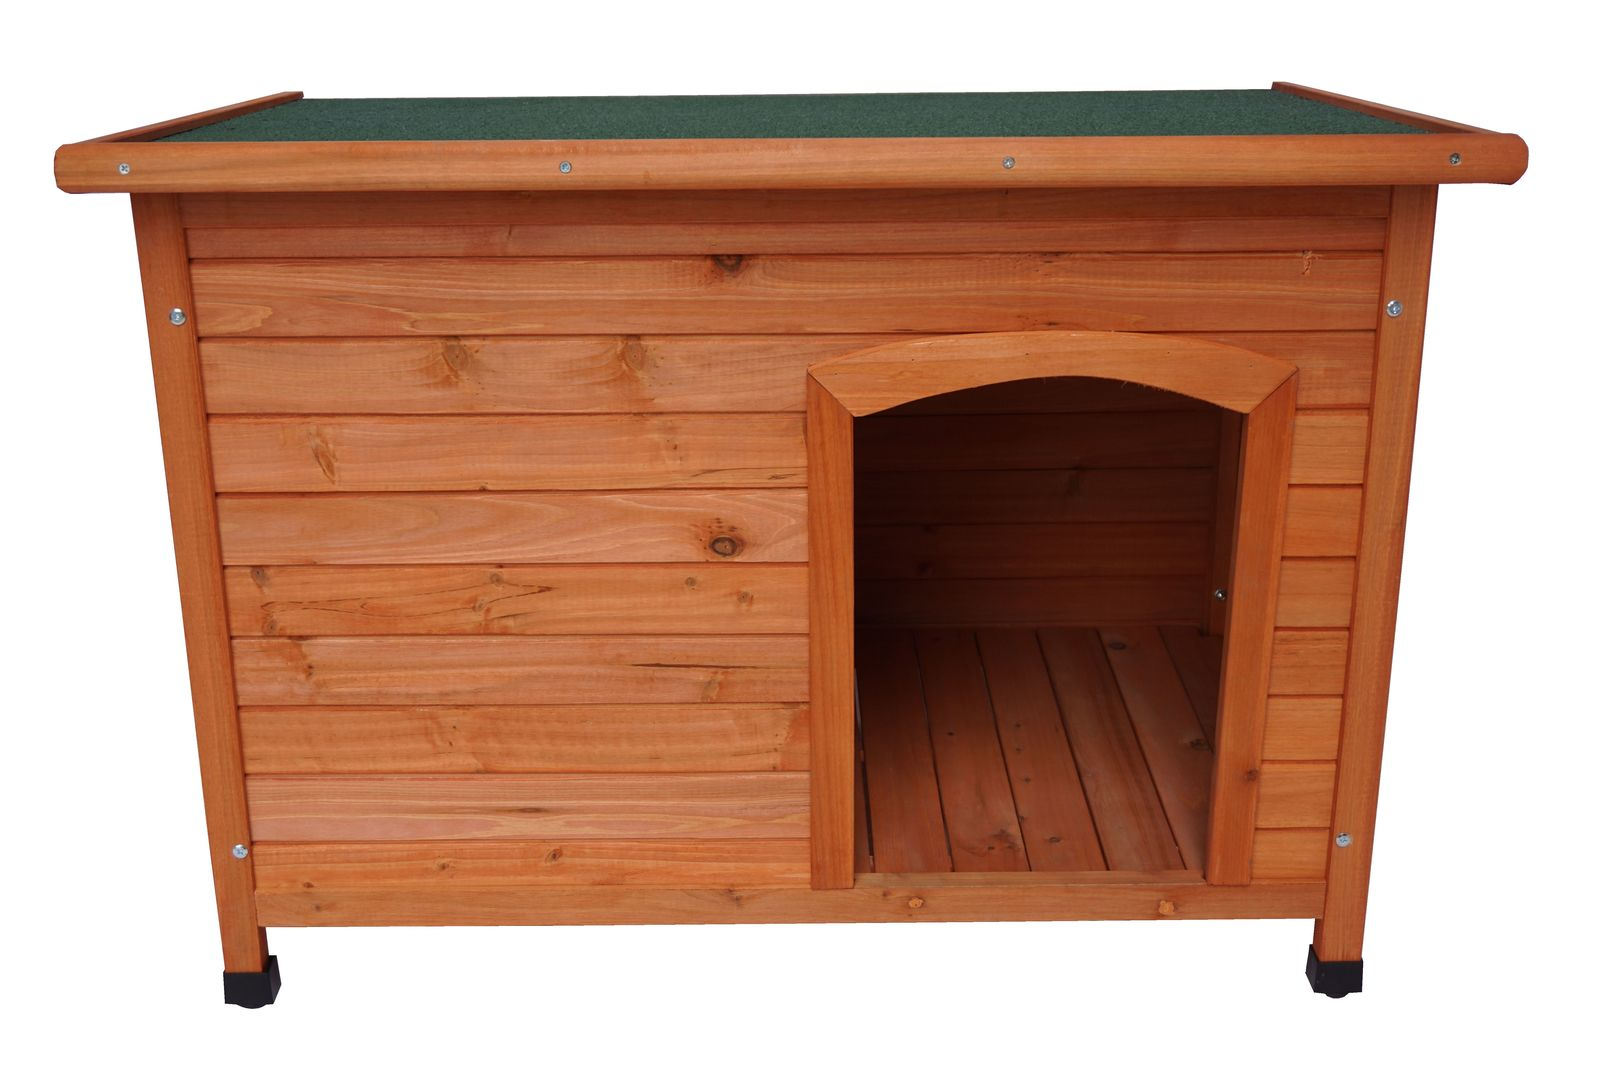 Medium Timber Pet Dog Wooden Cabin Kennel House